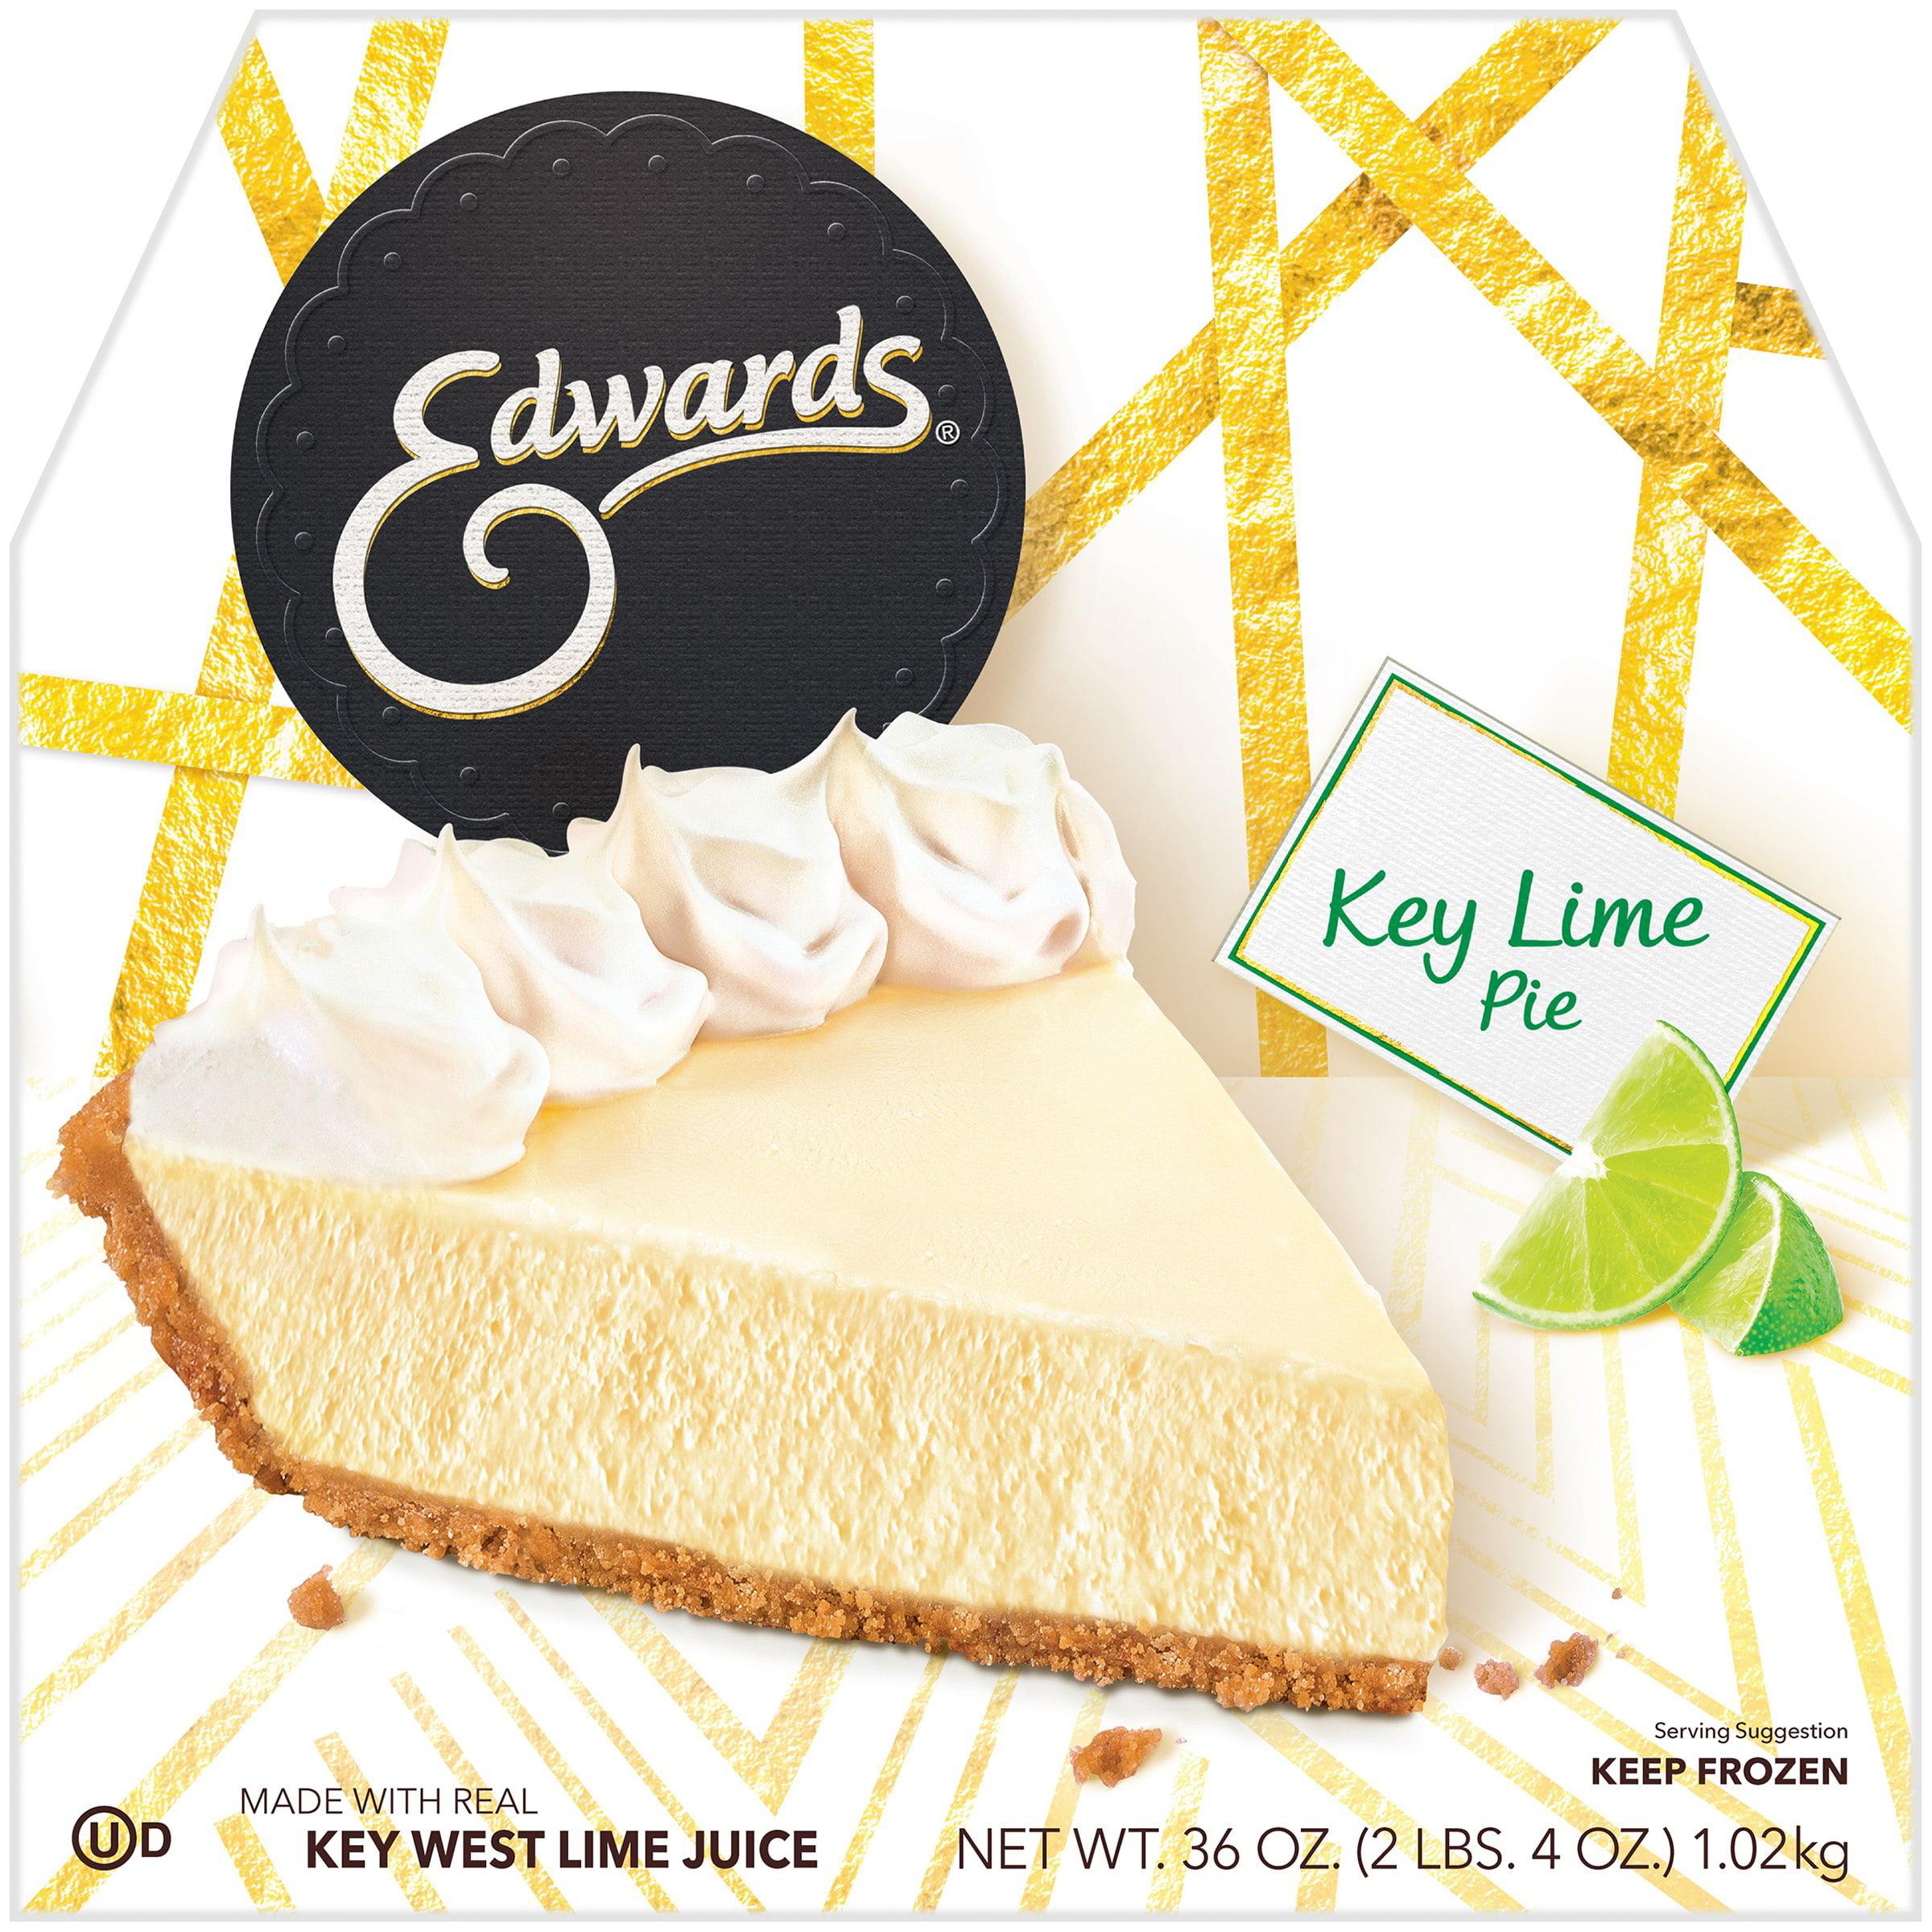 Edwards Key Lime Pie in a Cookie Crust 36 oz. Box - Walmart.com